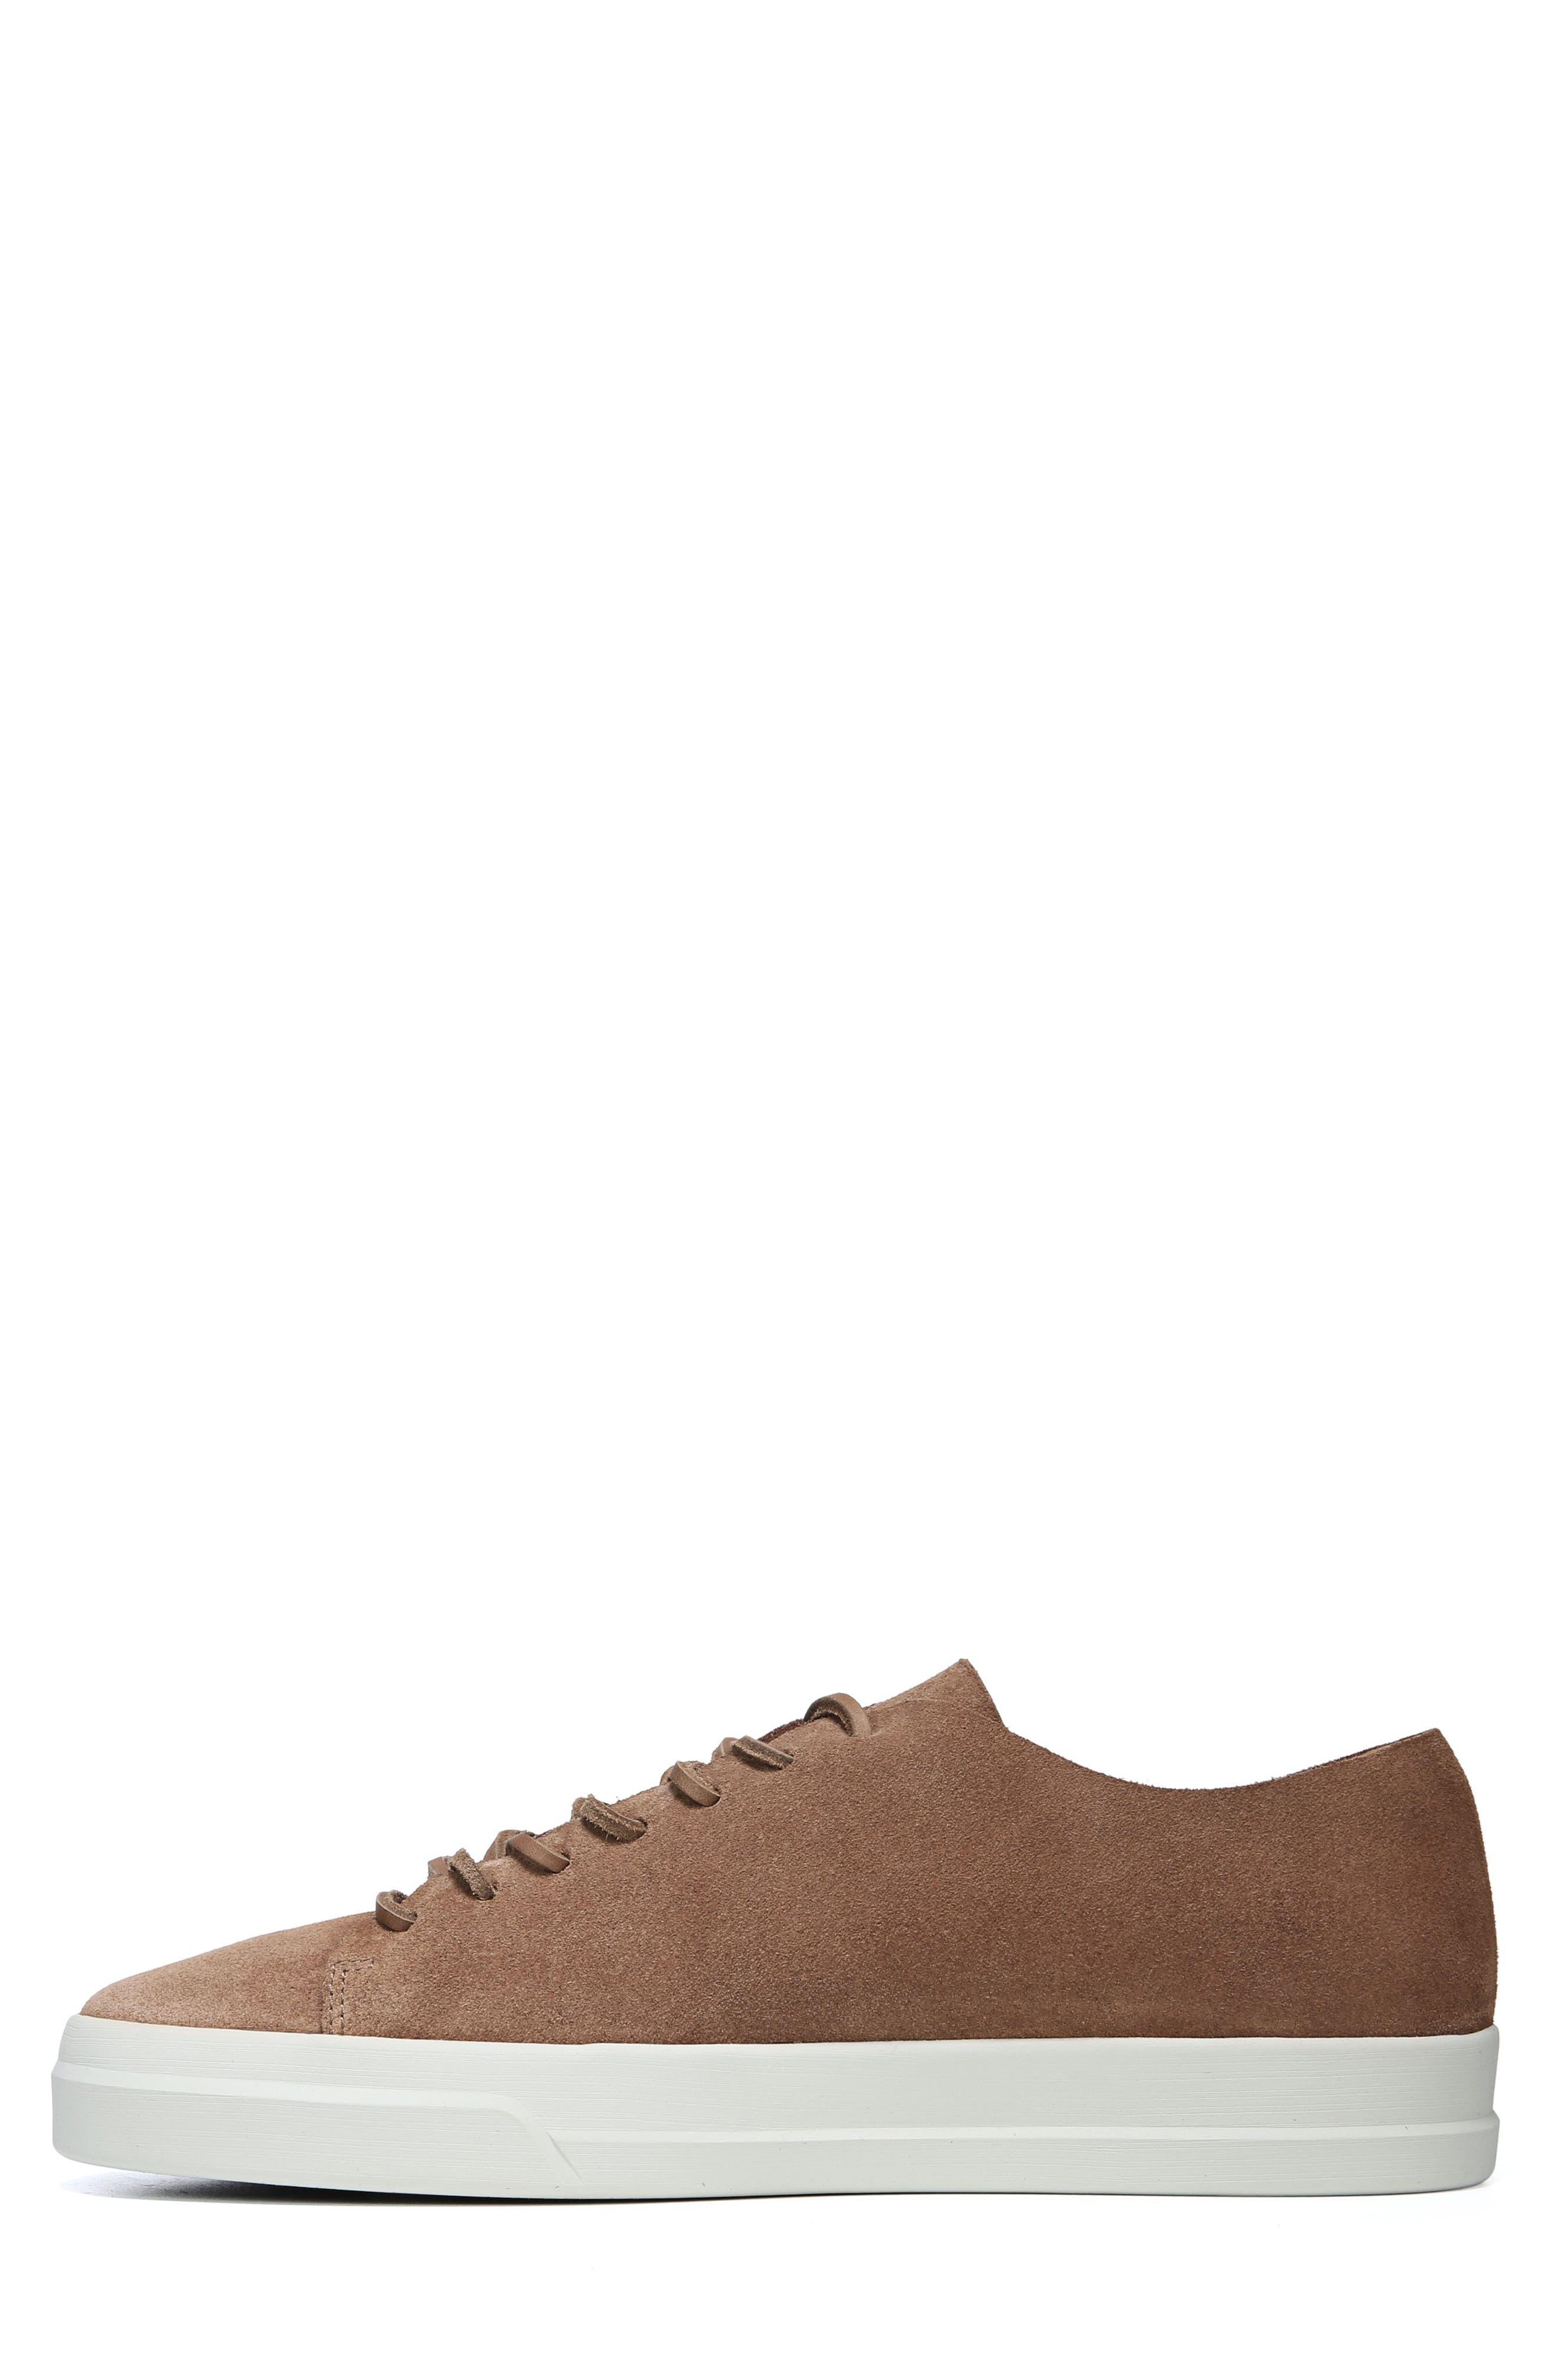 Copeland Sneaker,                             Alternate thumbnail 6, color,                             CEDAR